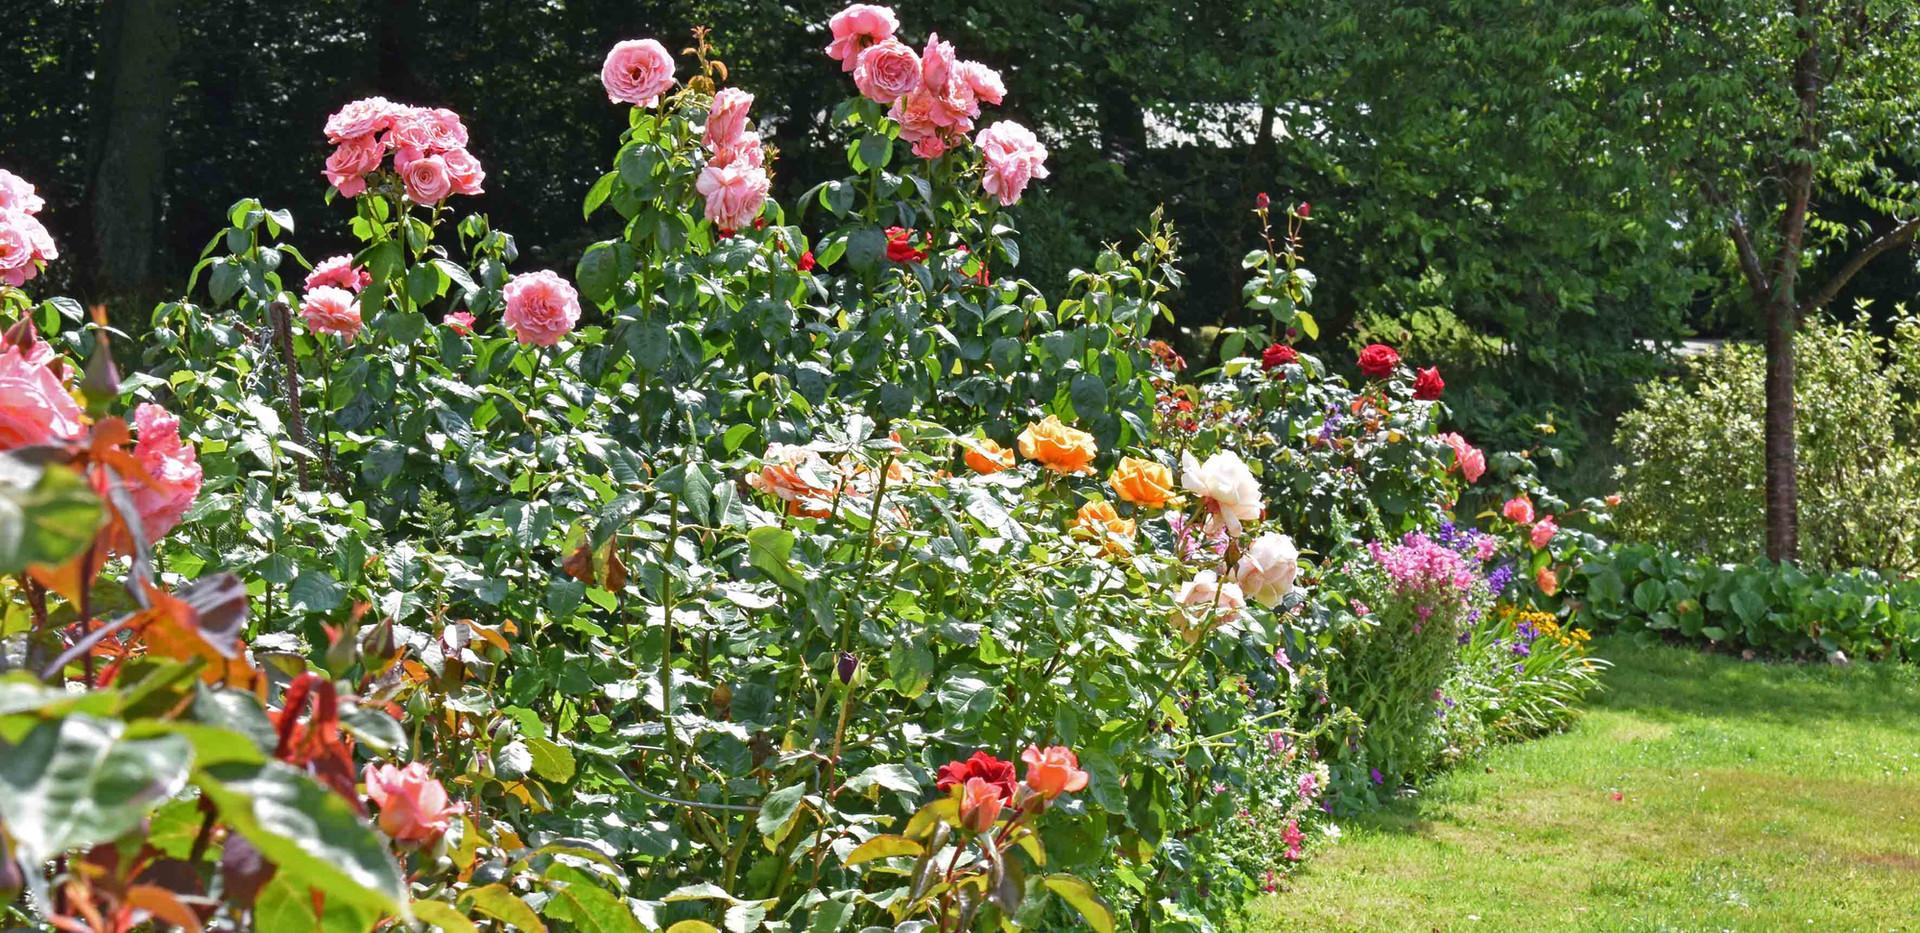 The Rose Border